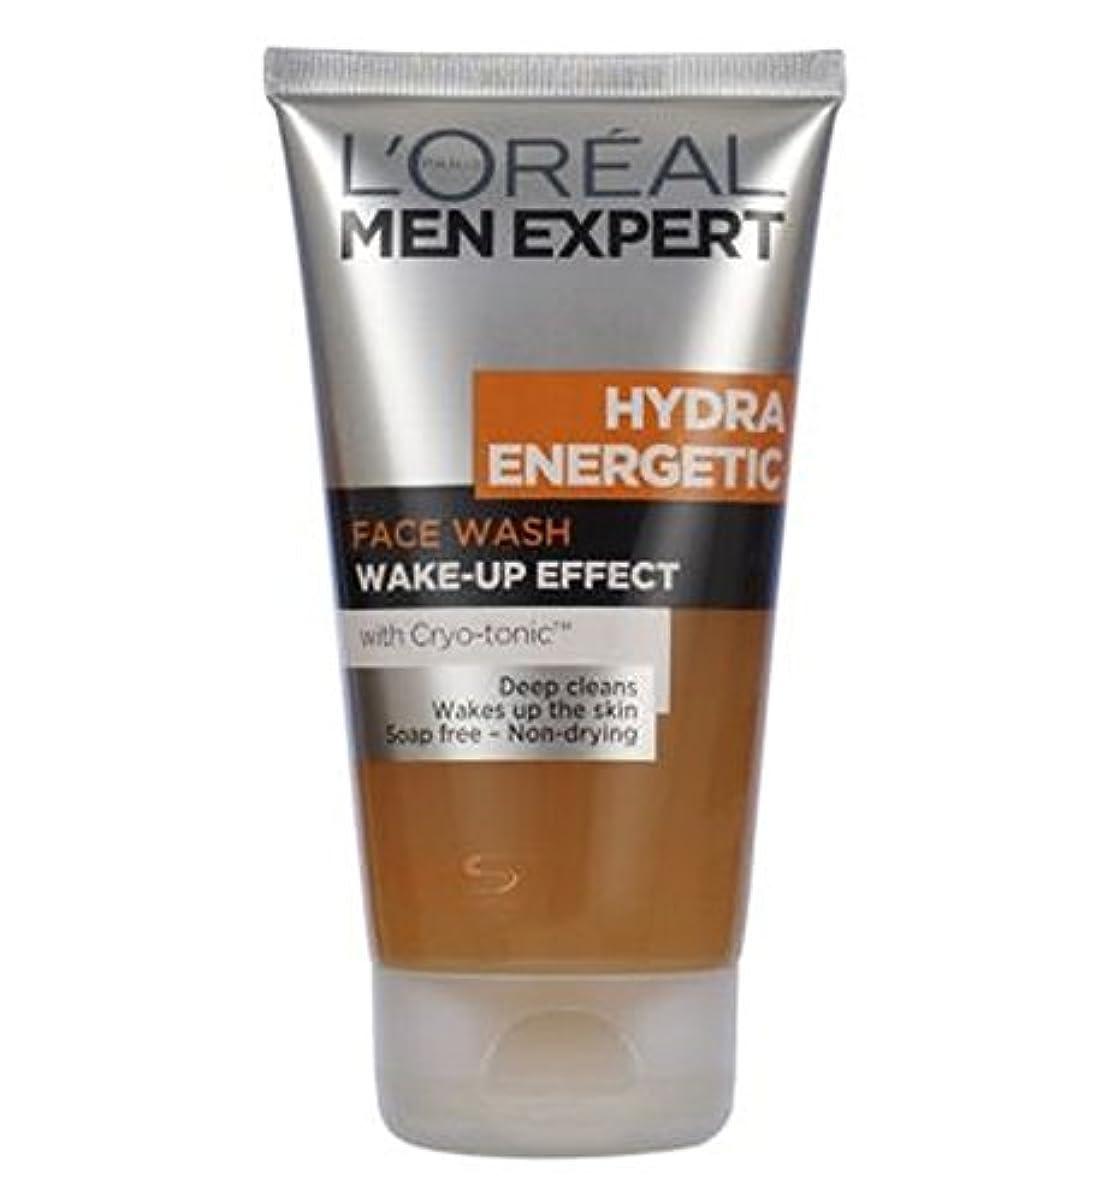 L'Oreal Men Expert Hydra Energetic Face Wash 150ml - ロレアルの男性の専門家ヒドラエネルギッシュな洗顔150ミリリットル (L'Oreal) [並行輸入品]